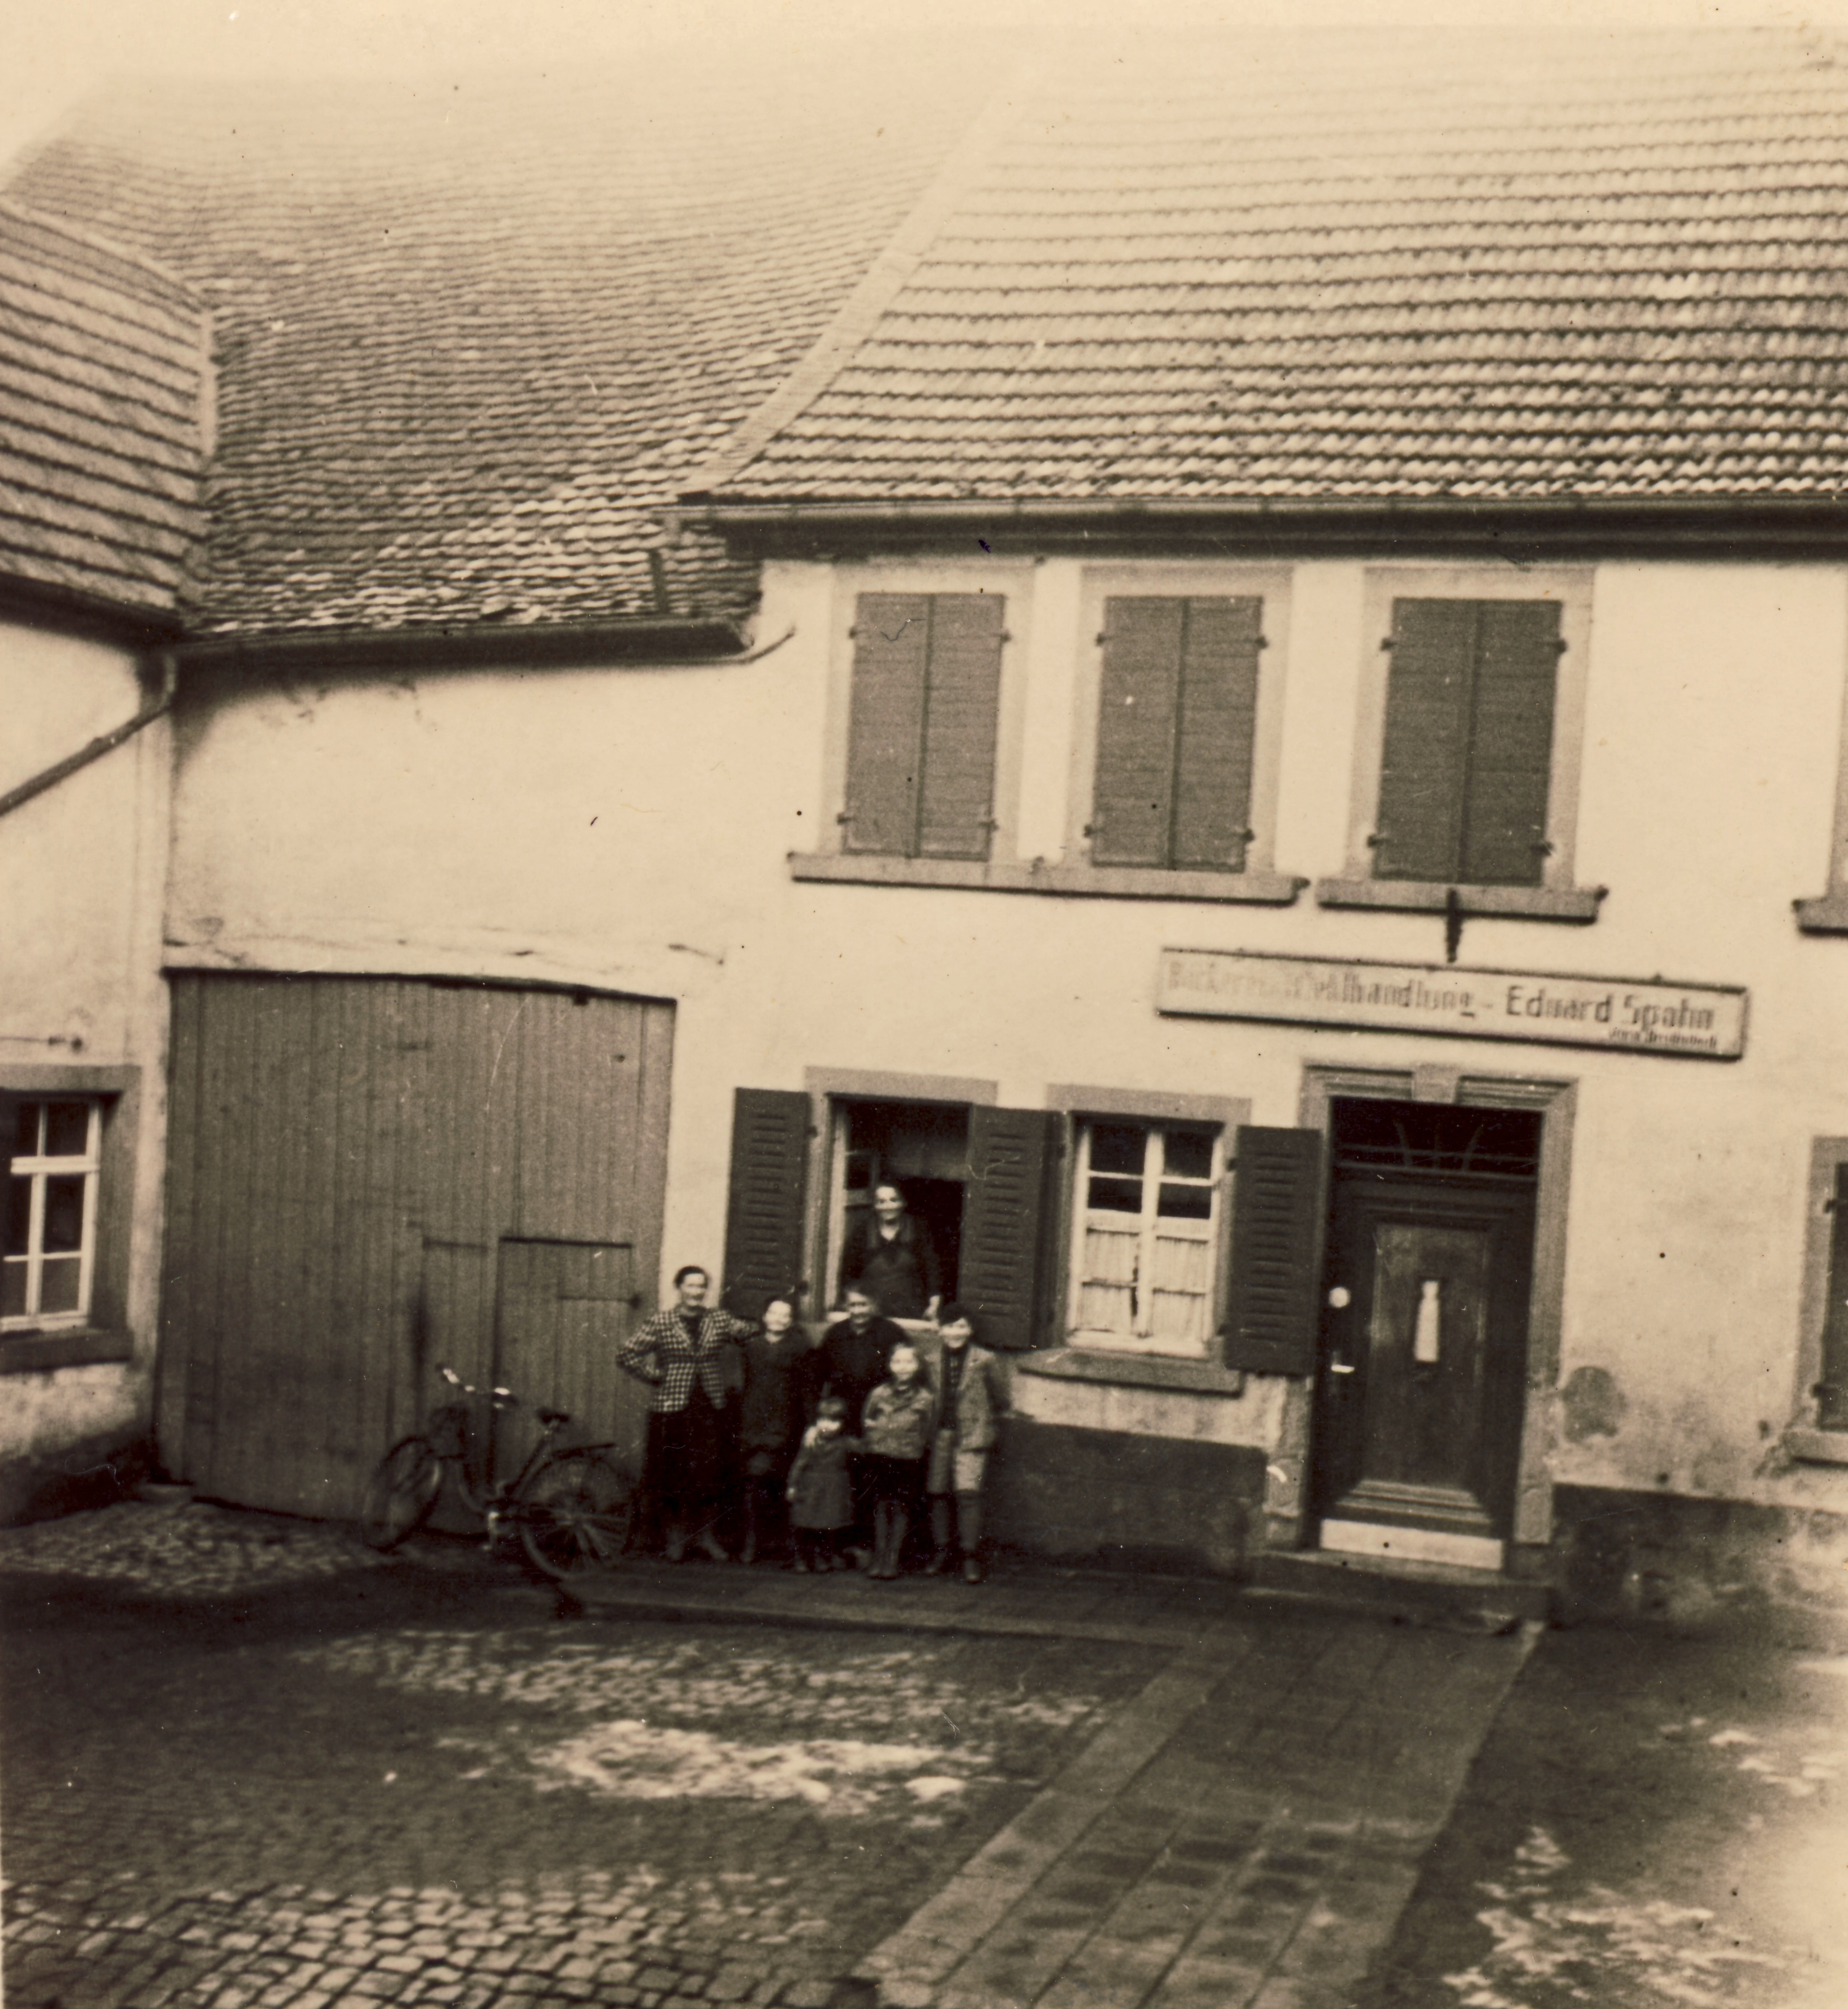 Bäckerei Eduard Spohn in den 1940er Jahren